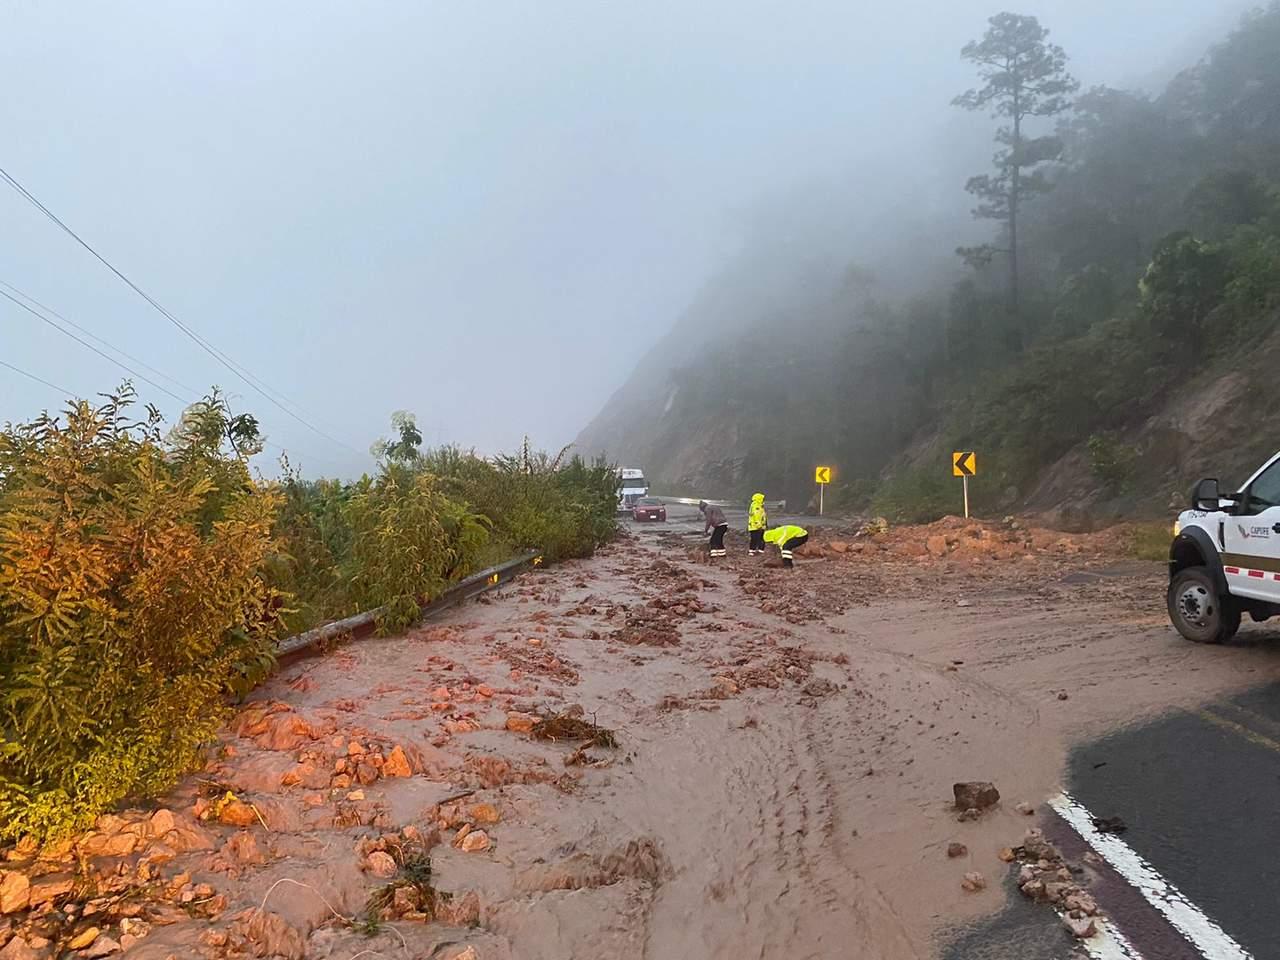 Supercarretera Durango-Mazatlán está cerrada, detalla Capufe